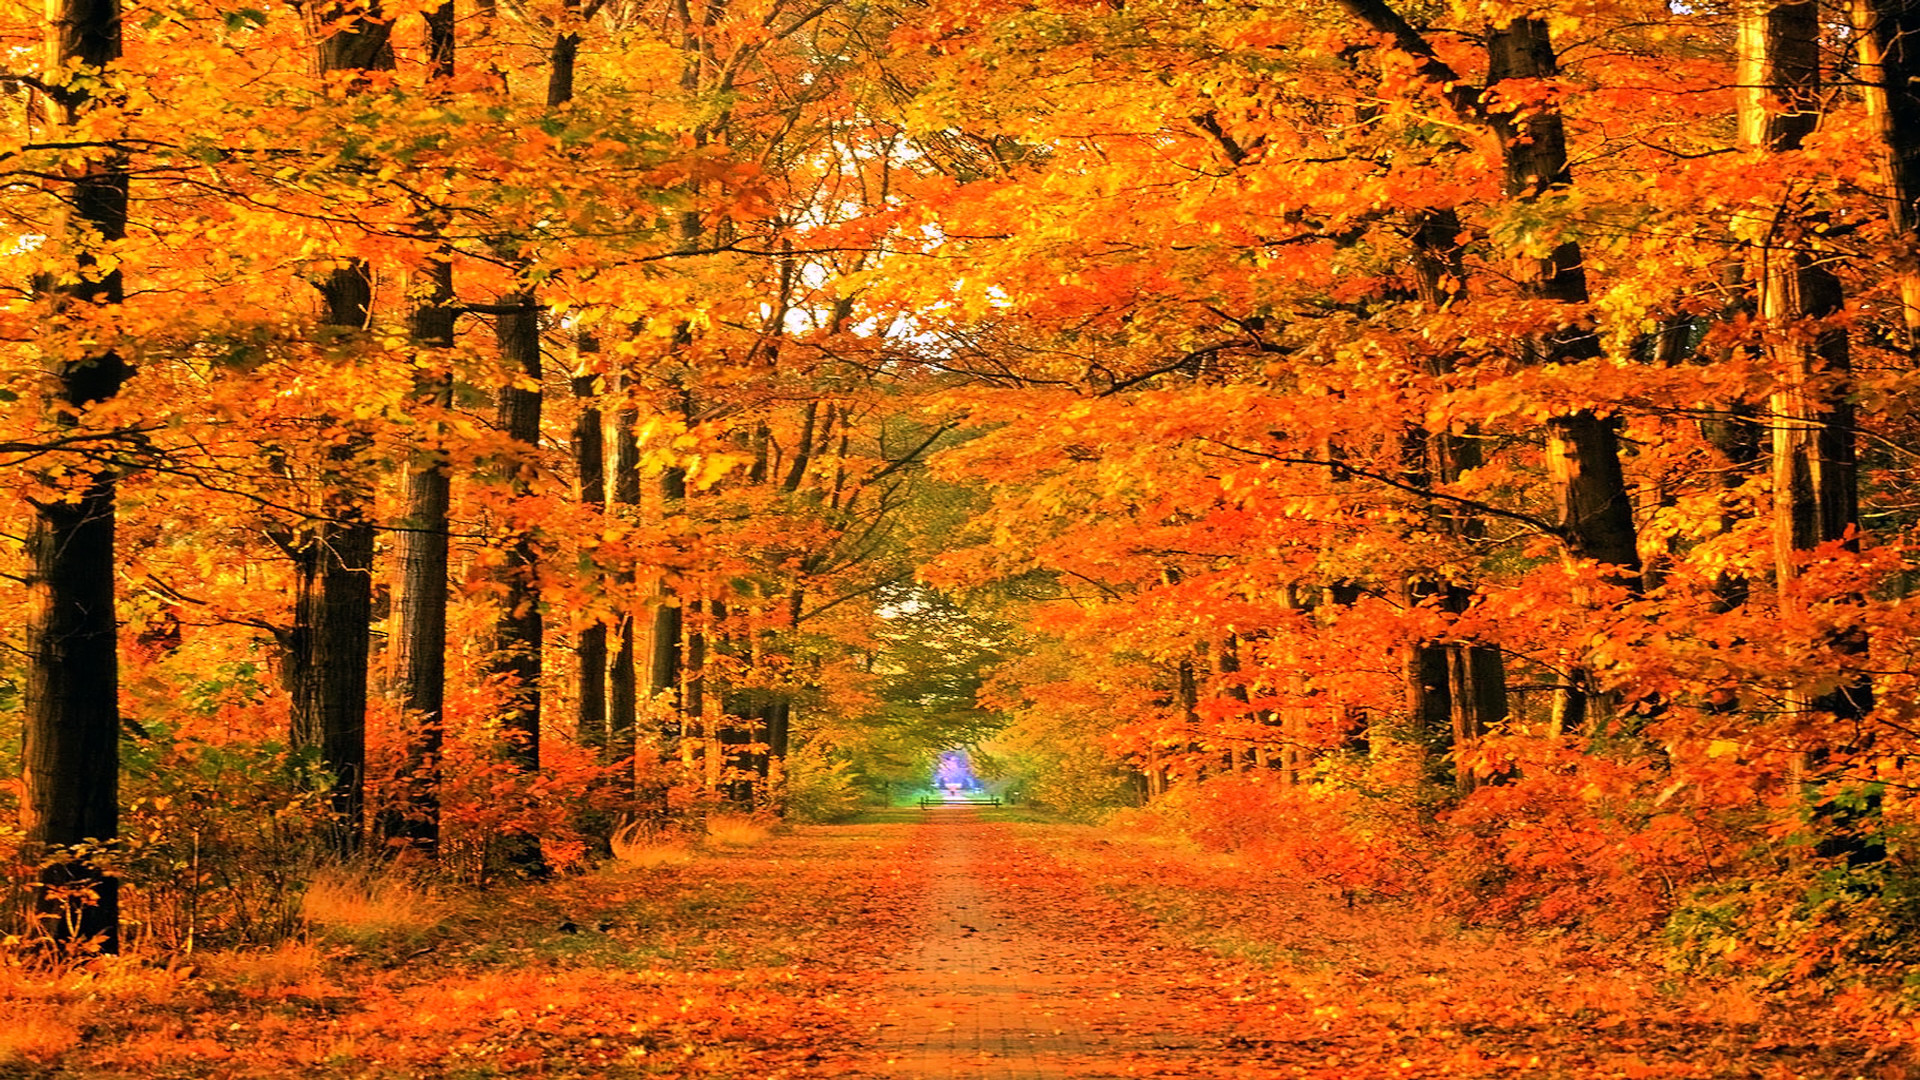 autumn pictures for desktop backgrounds